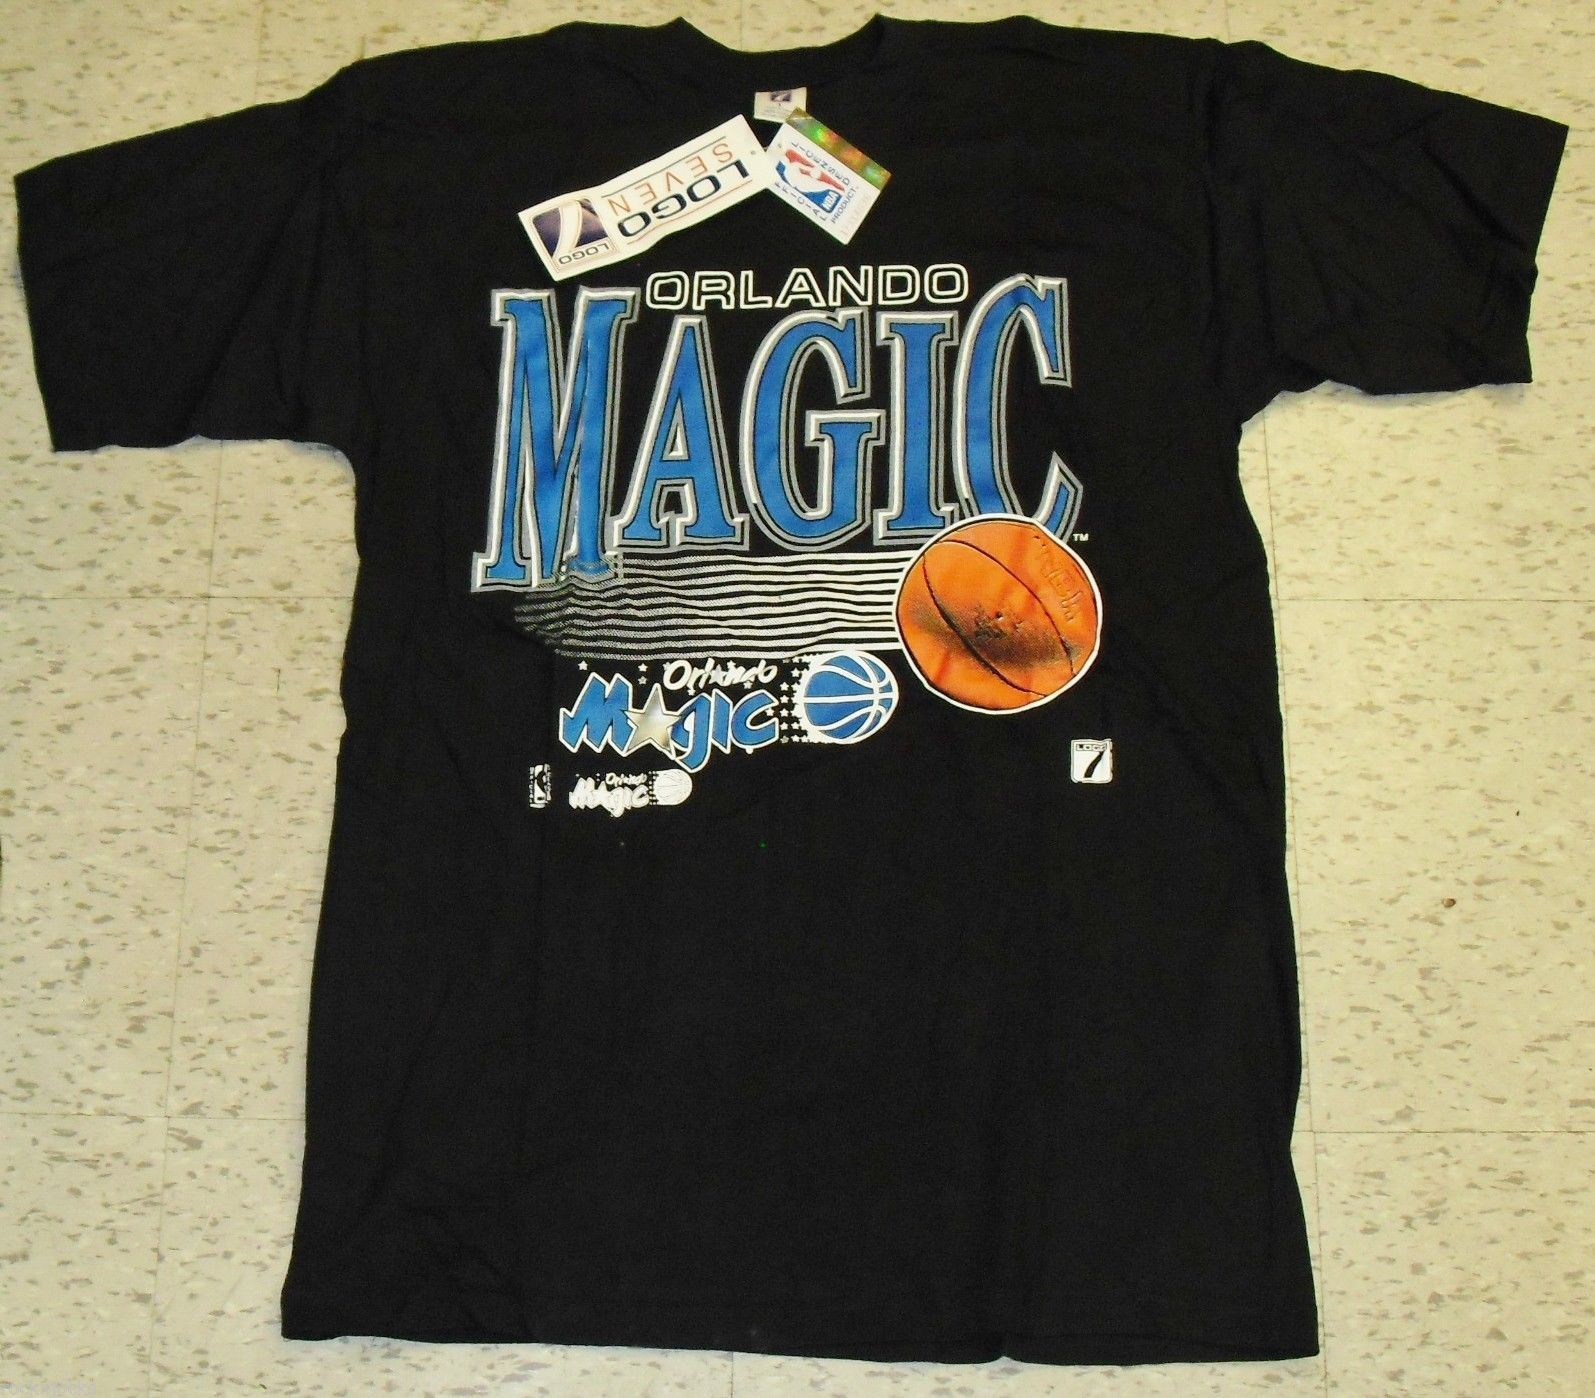 Orlando Magic Vintage 90s T Shirt New w Tags Sz Large Original Shaq Years  712cee3ca